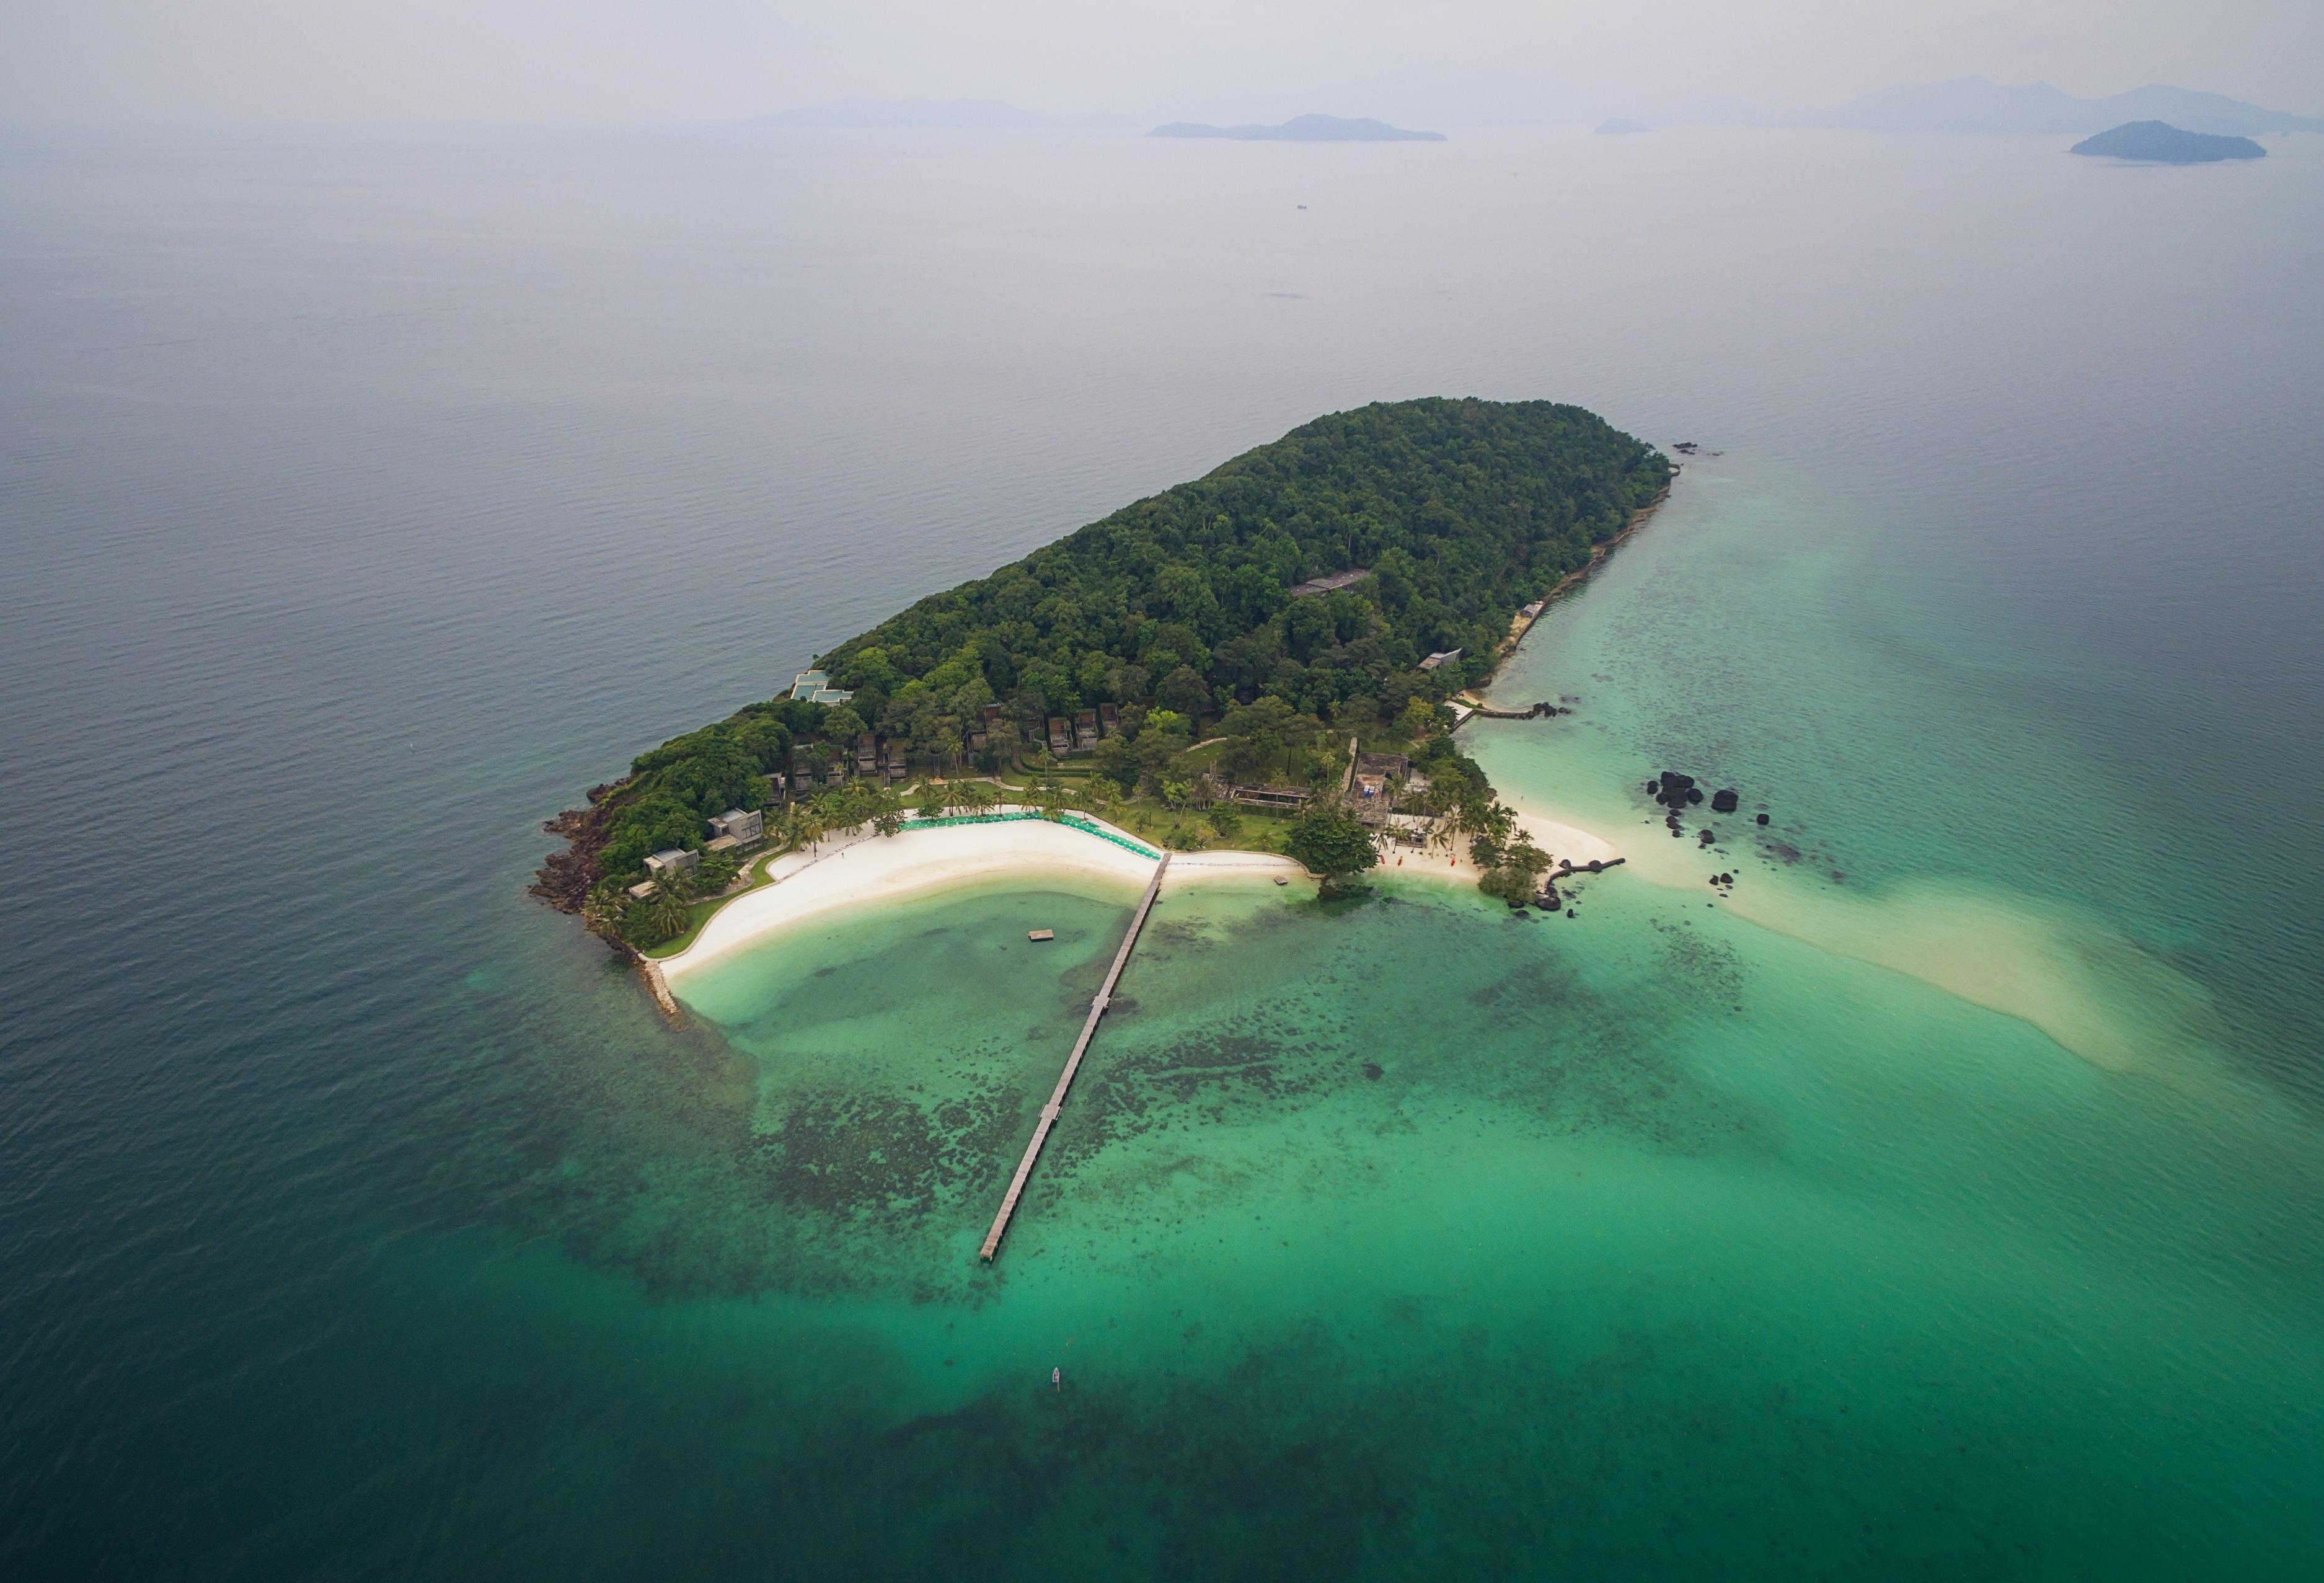 Green View Resort Nakhonratchasima Thailand